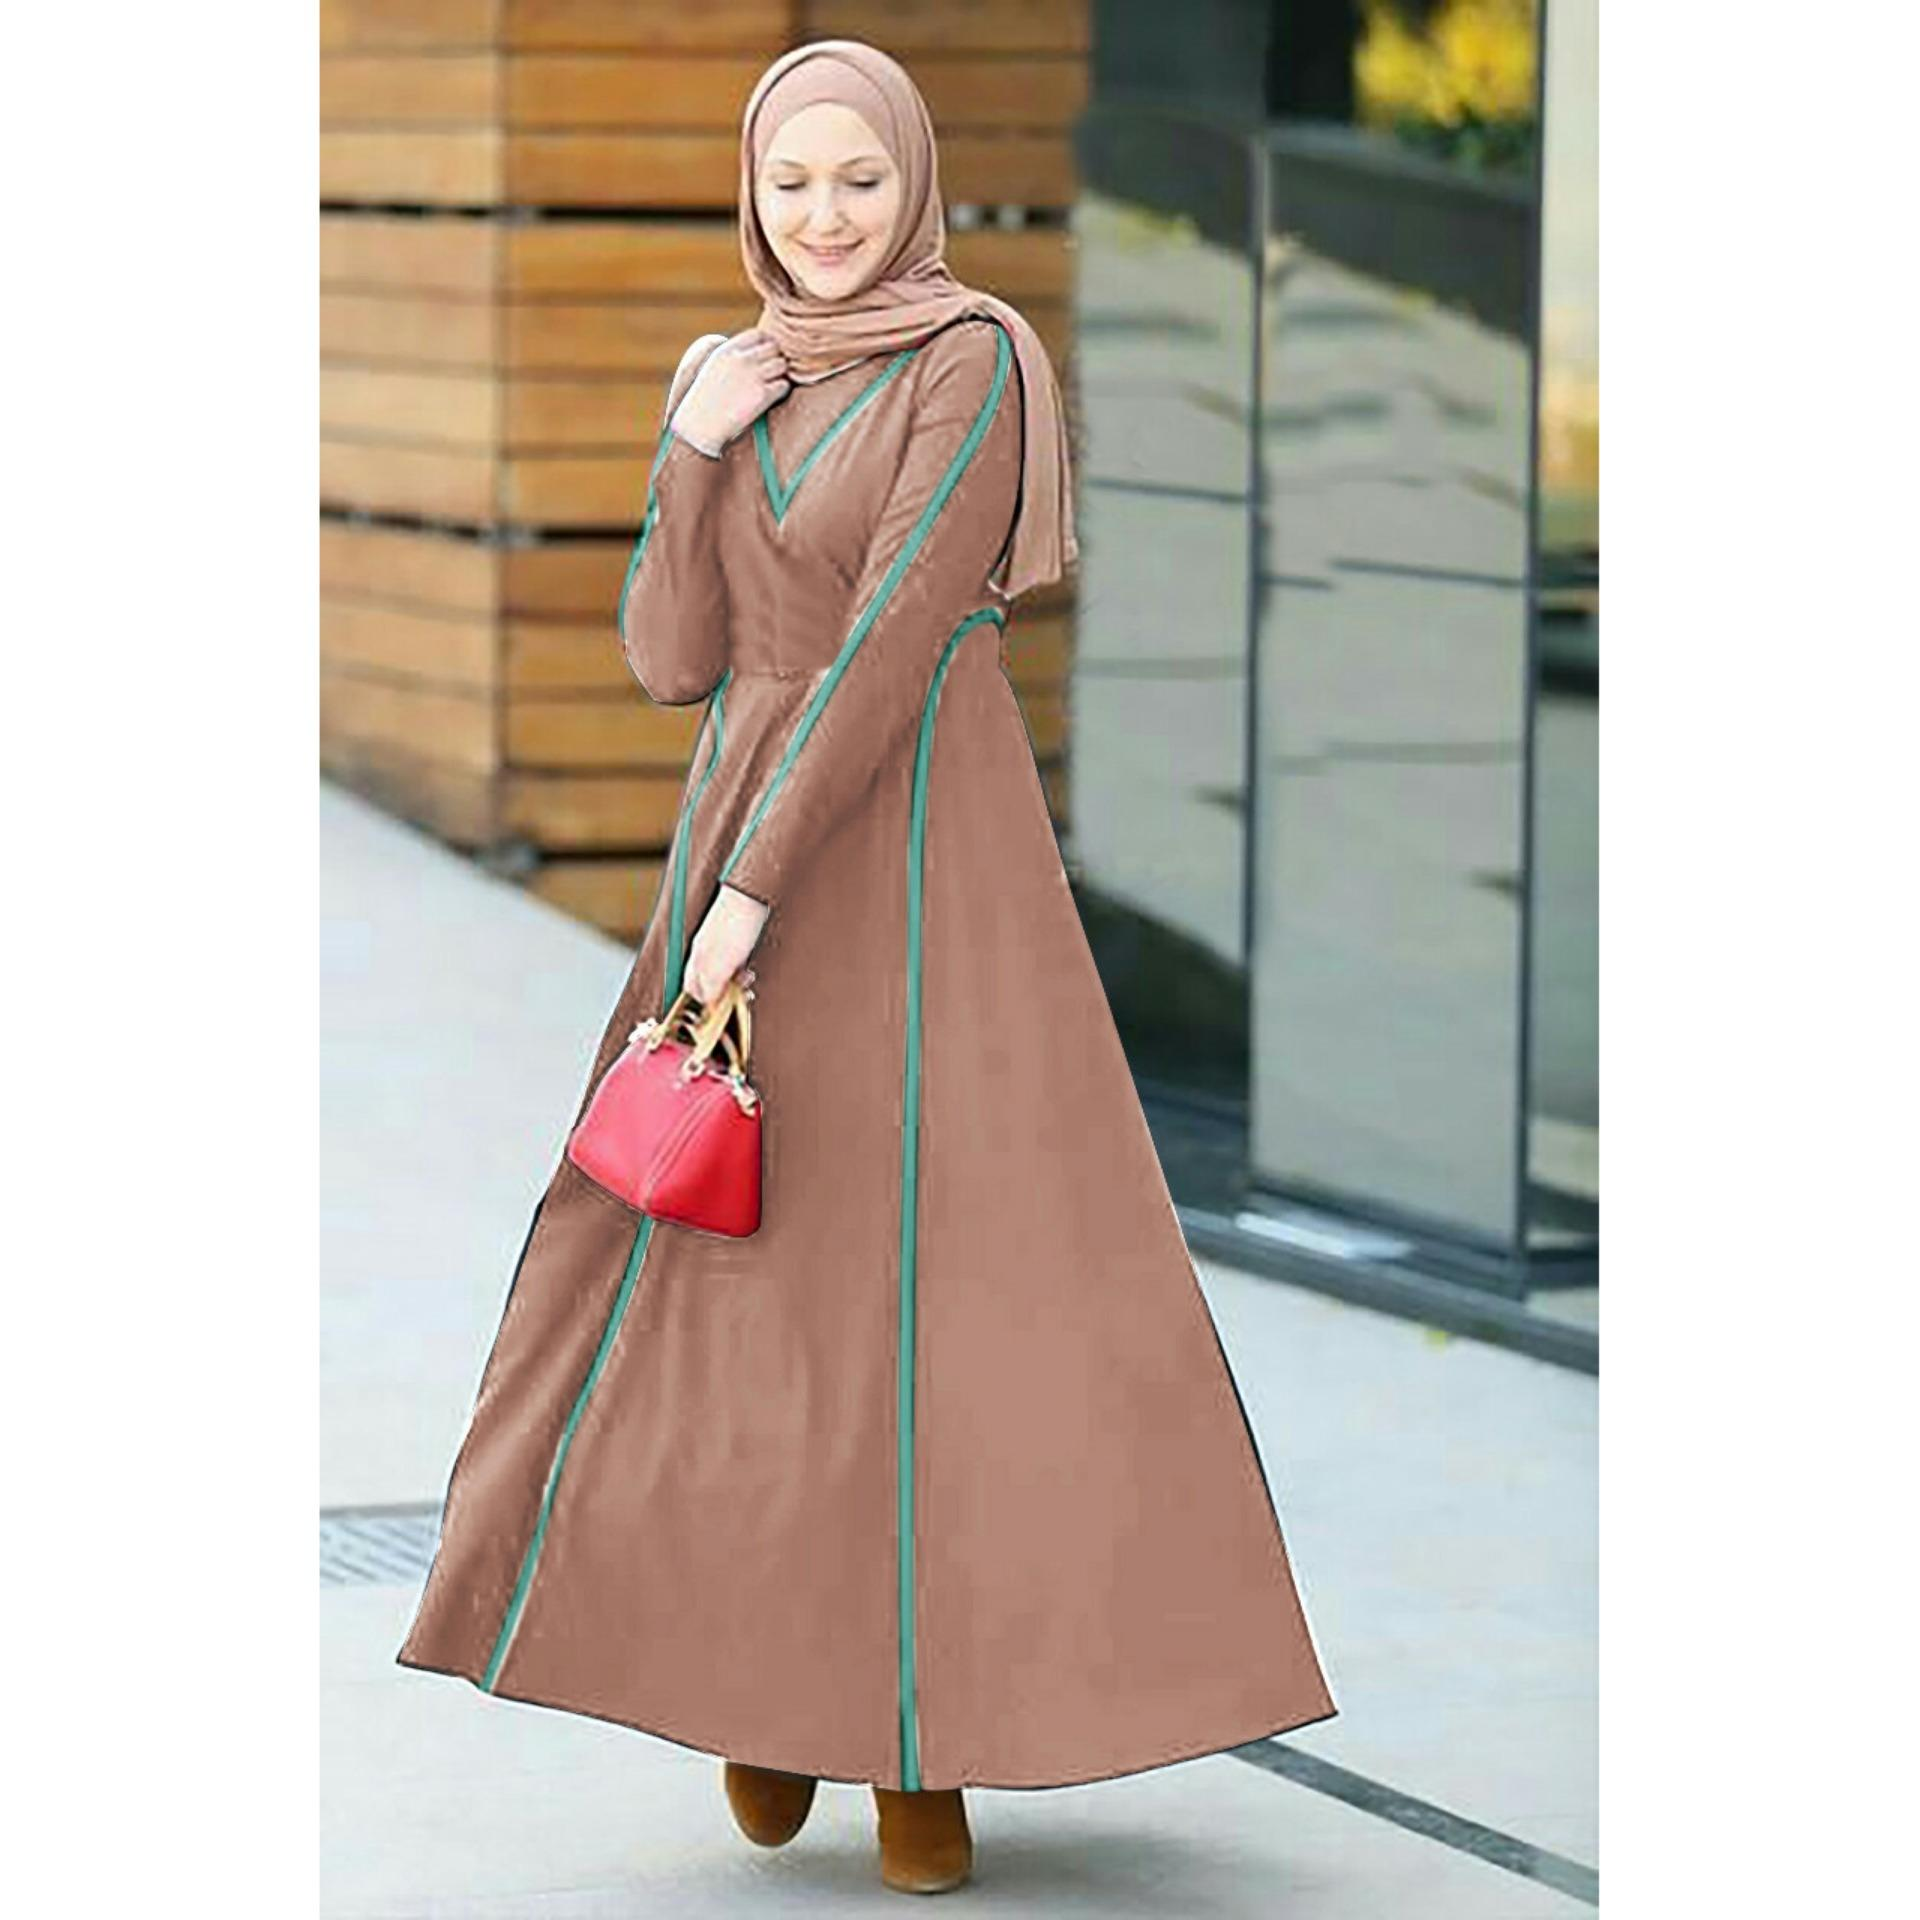 Kedai_baju Muslim Wanita / Gamis Mia Coklat - SR